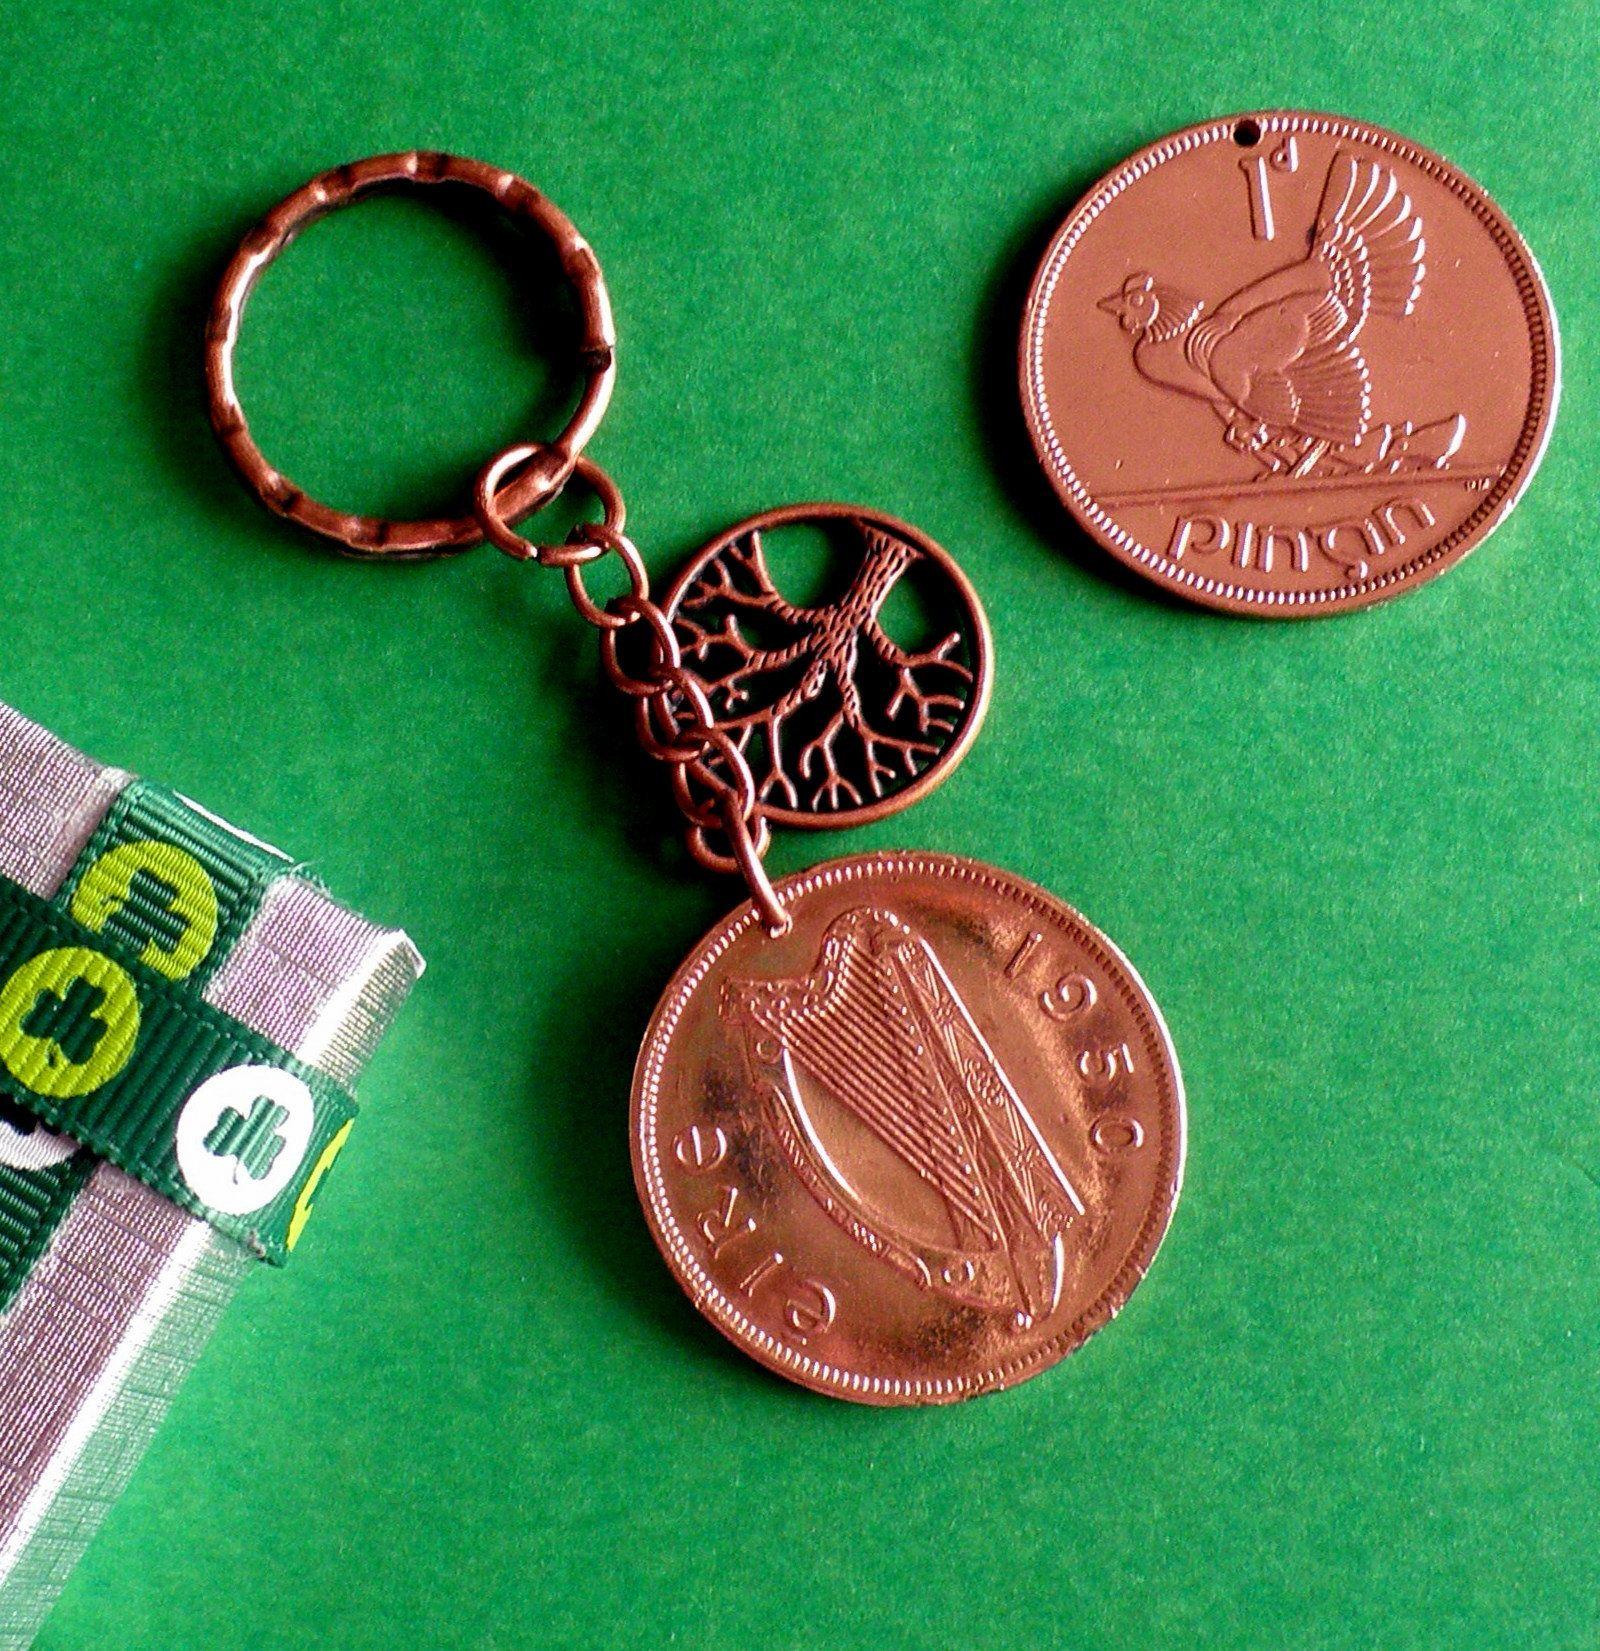 Pin on Irish Gifts for Guys